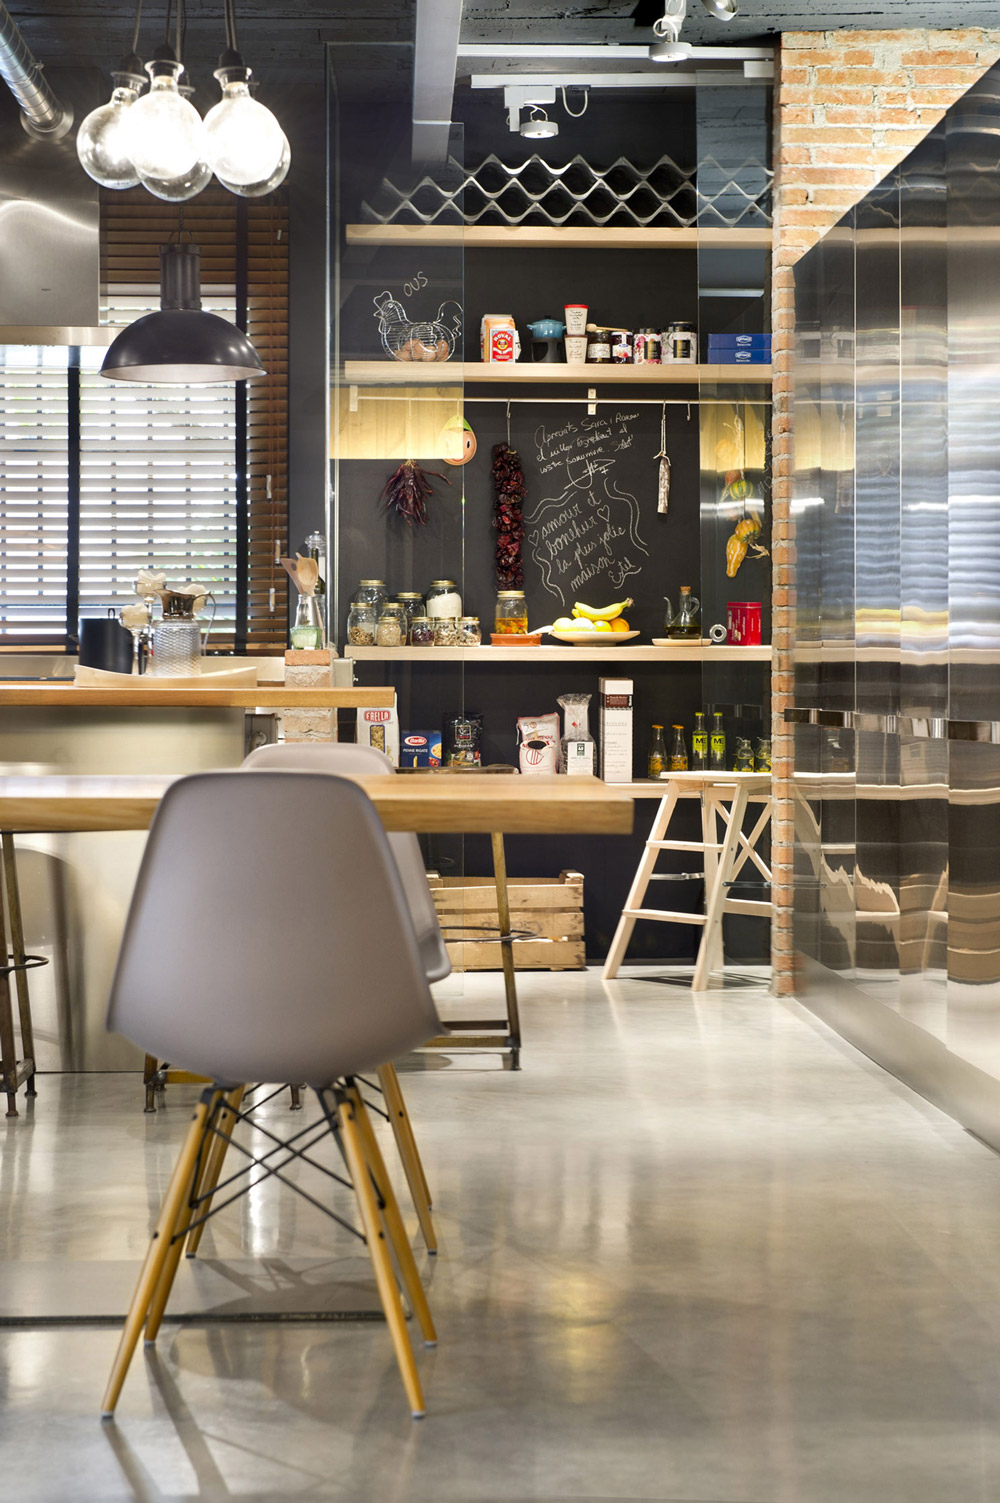 køkken-spisestue-loft-stil-home-terrassa-spanien